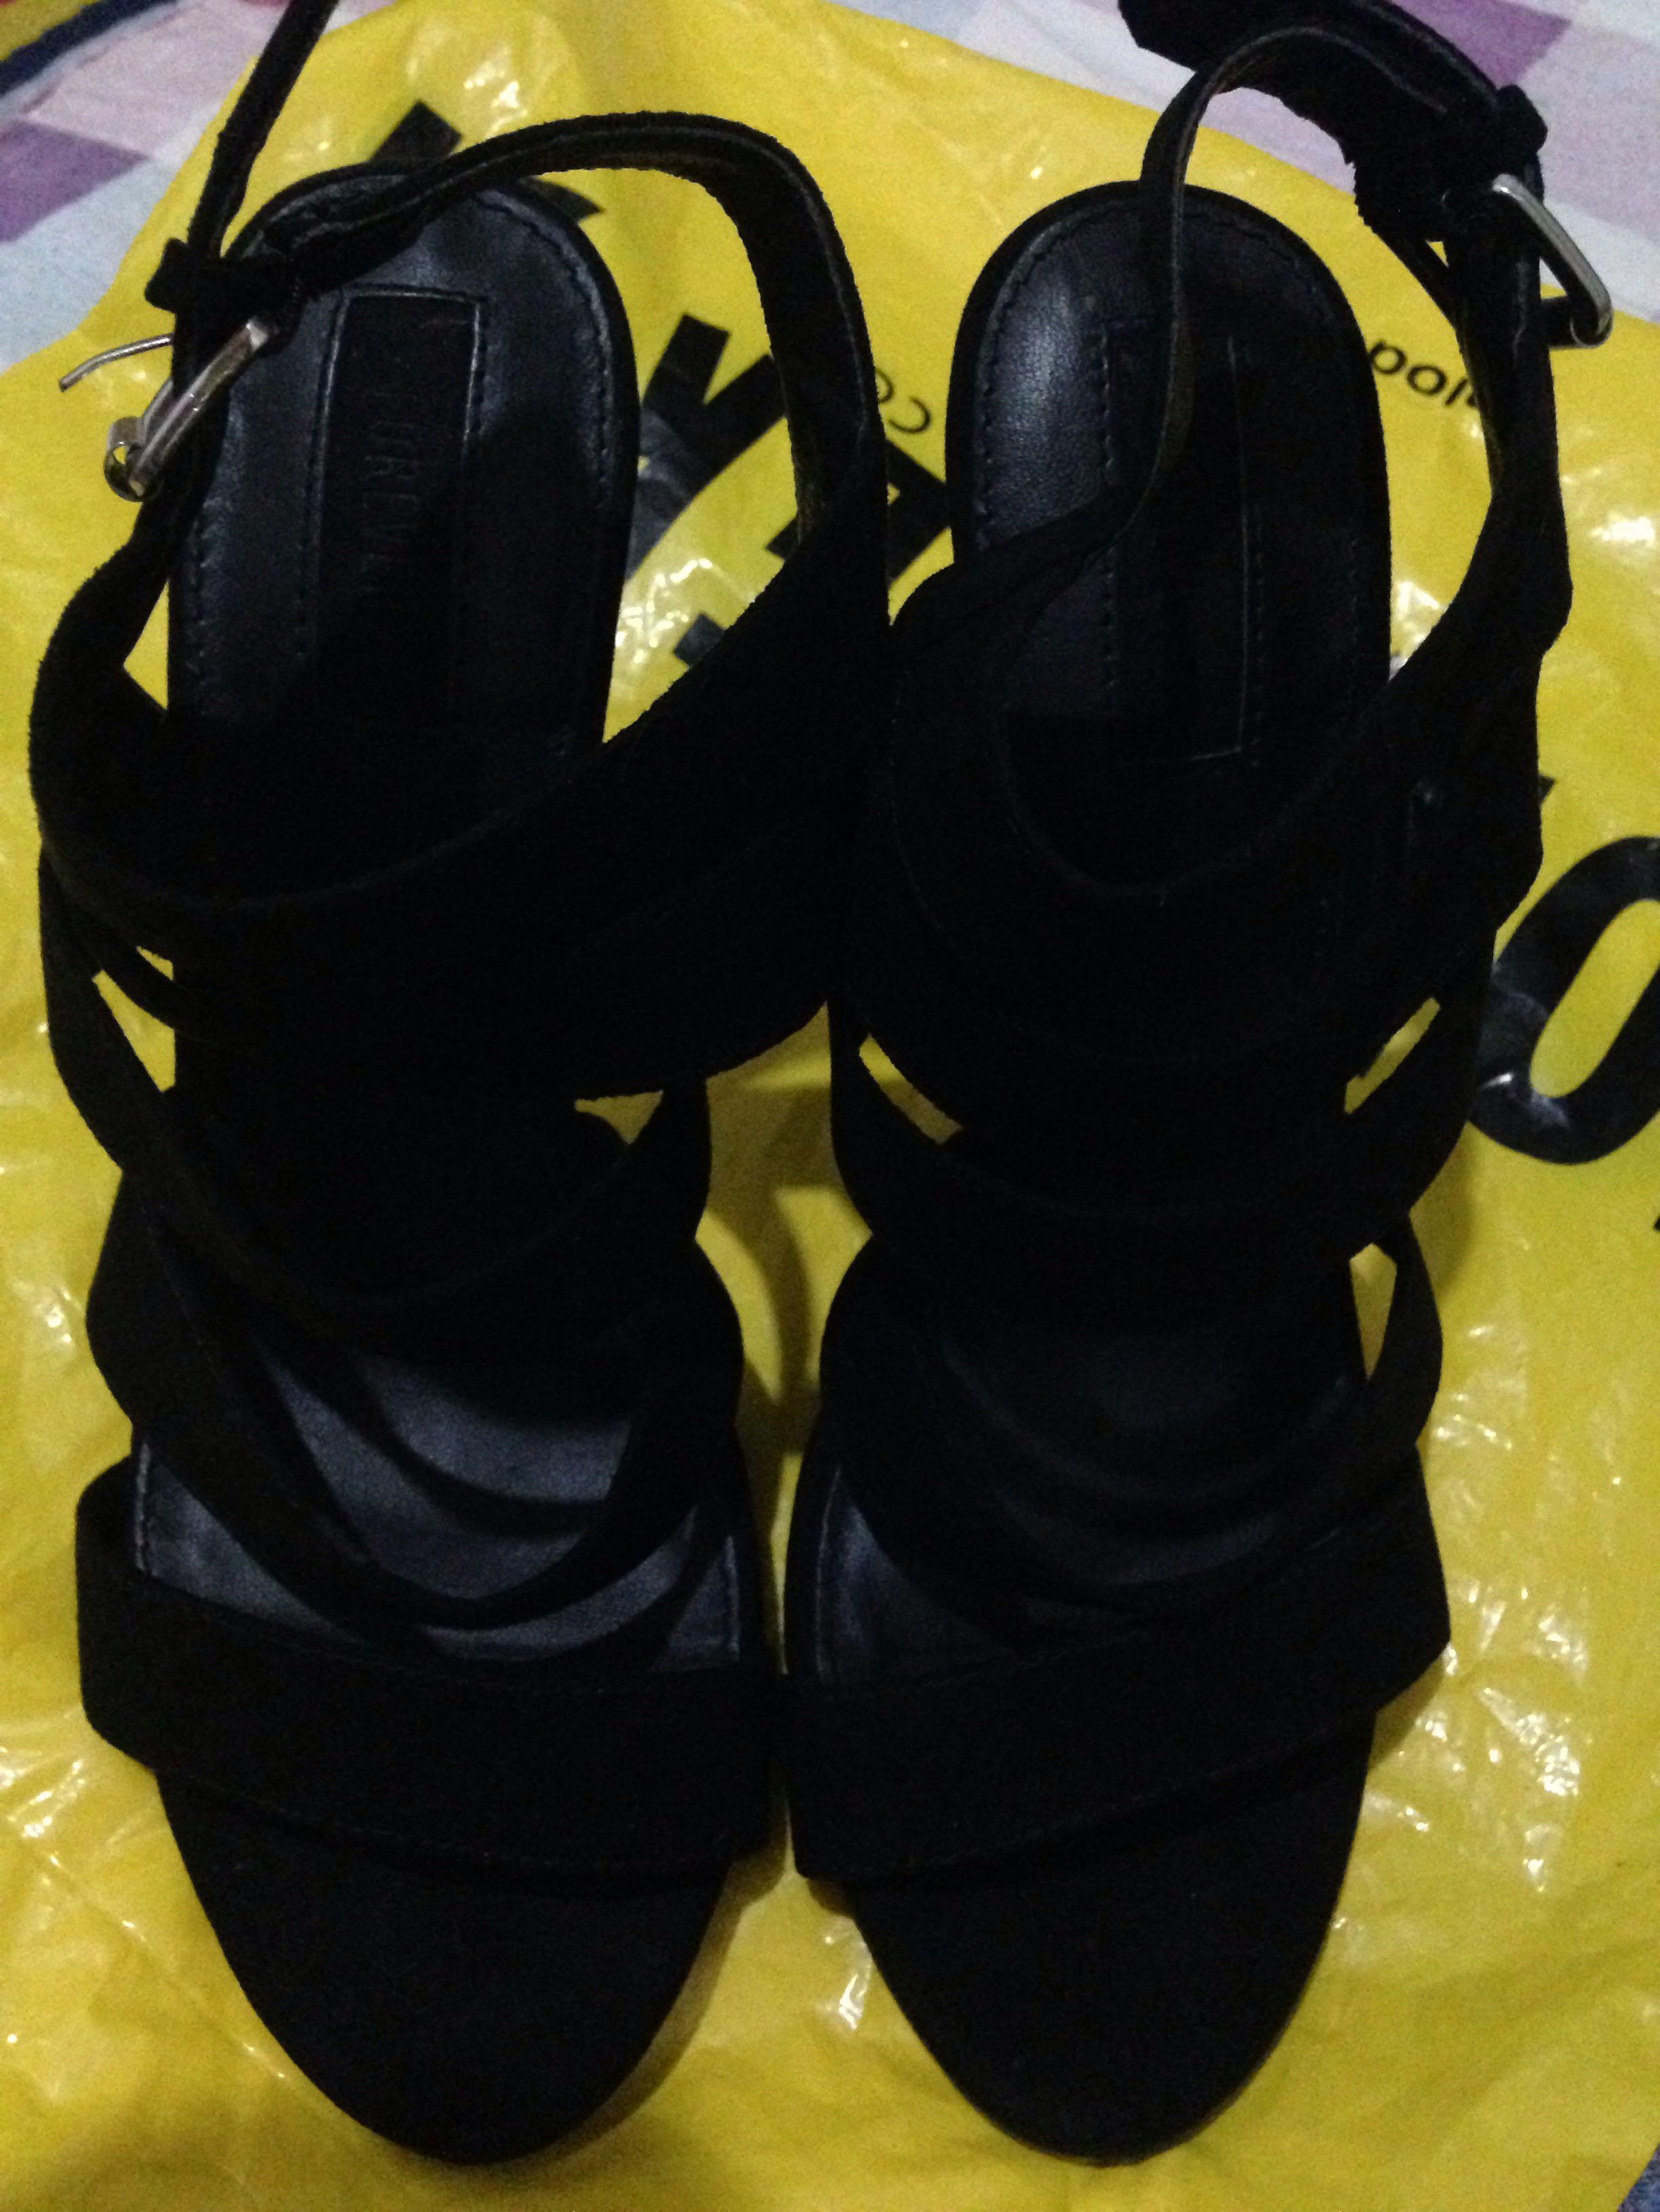 314d7eaadf9b Repriced! Forever 21 High Heel Sandals